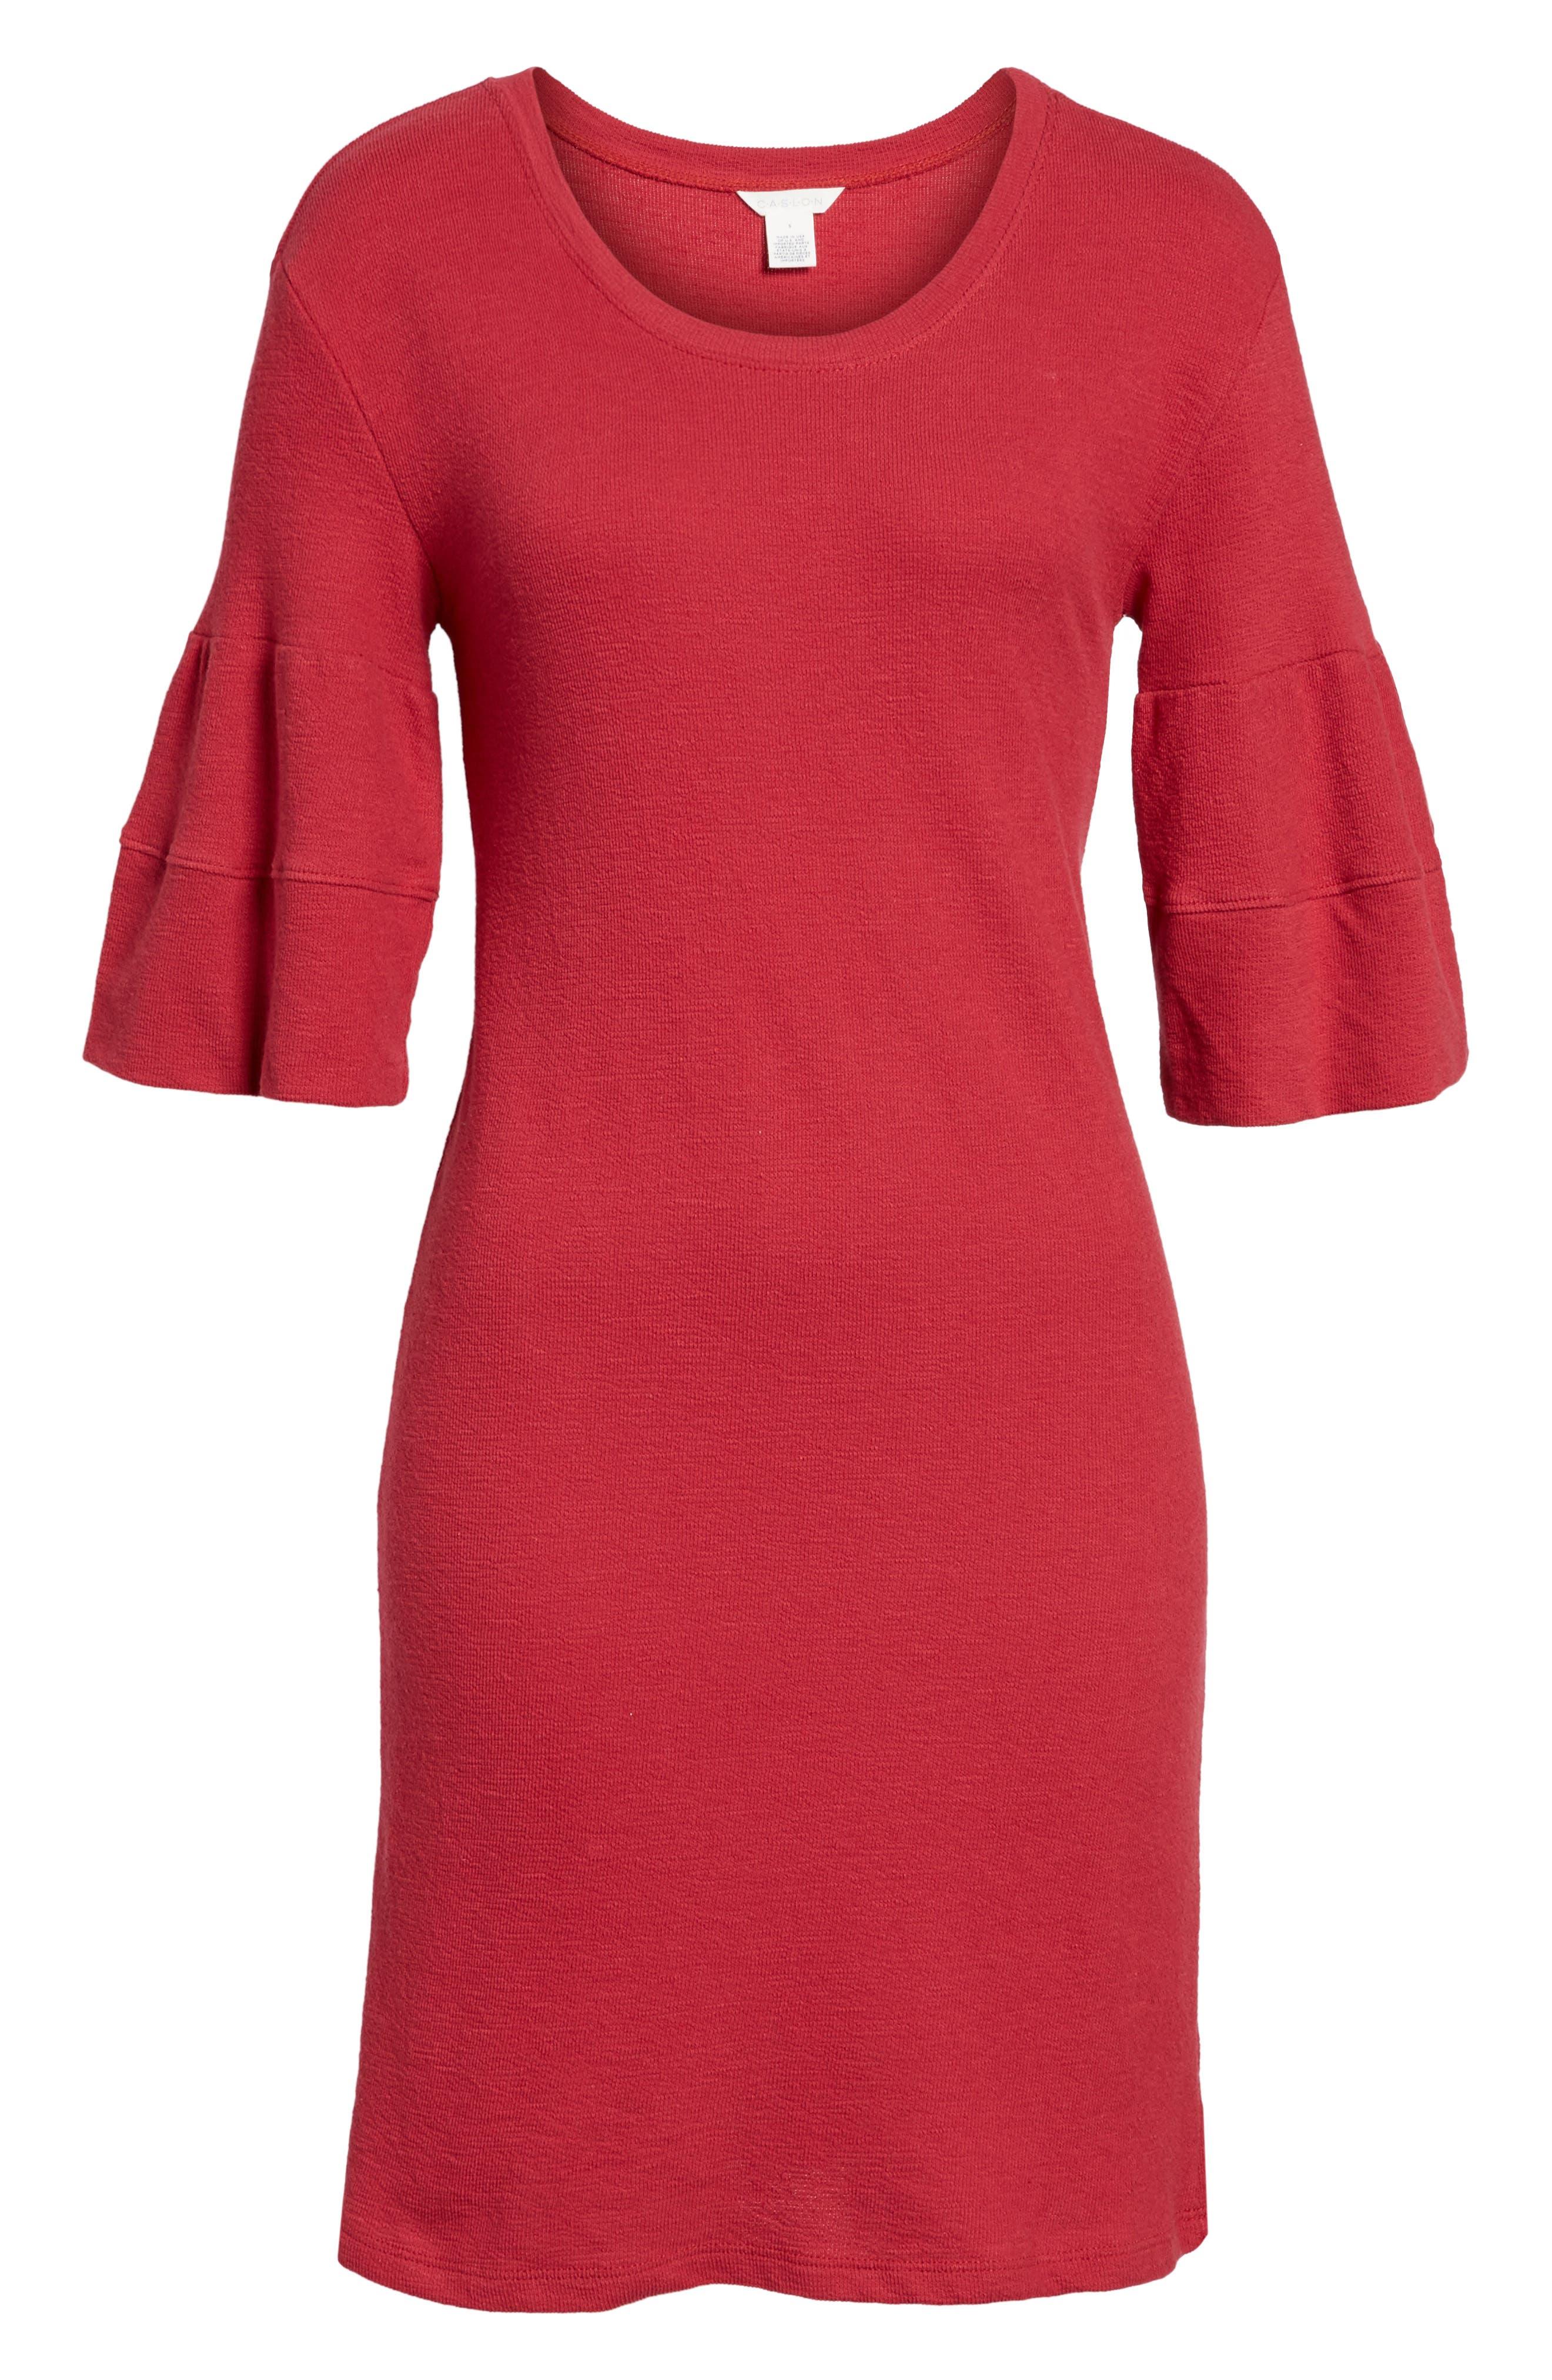 Ruffle Sleeve Knit Dress,                             Alternate thumbnail 18, color,